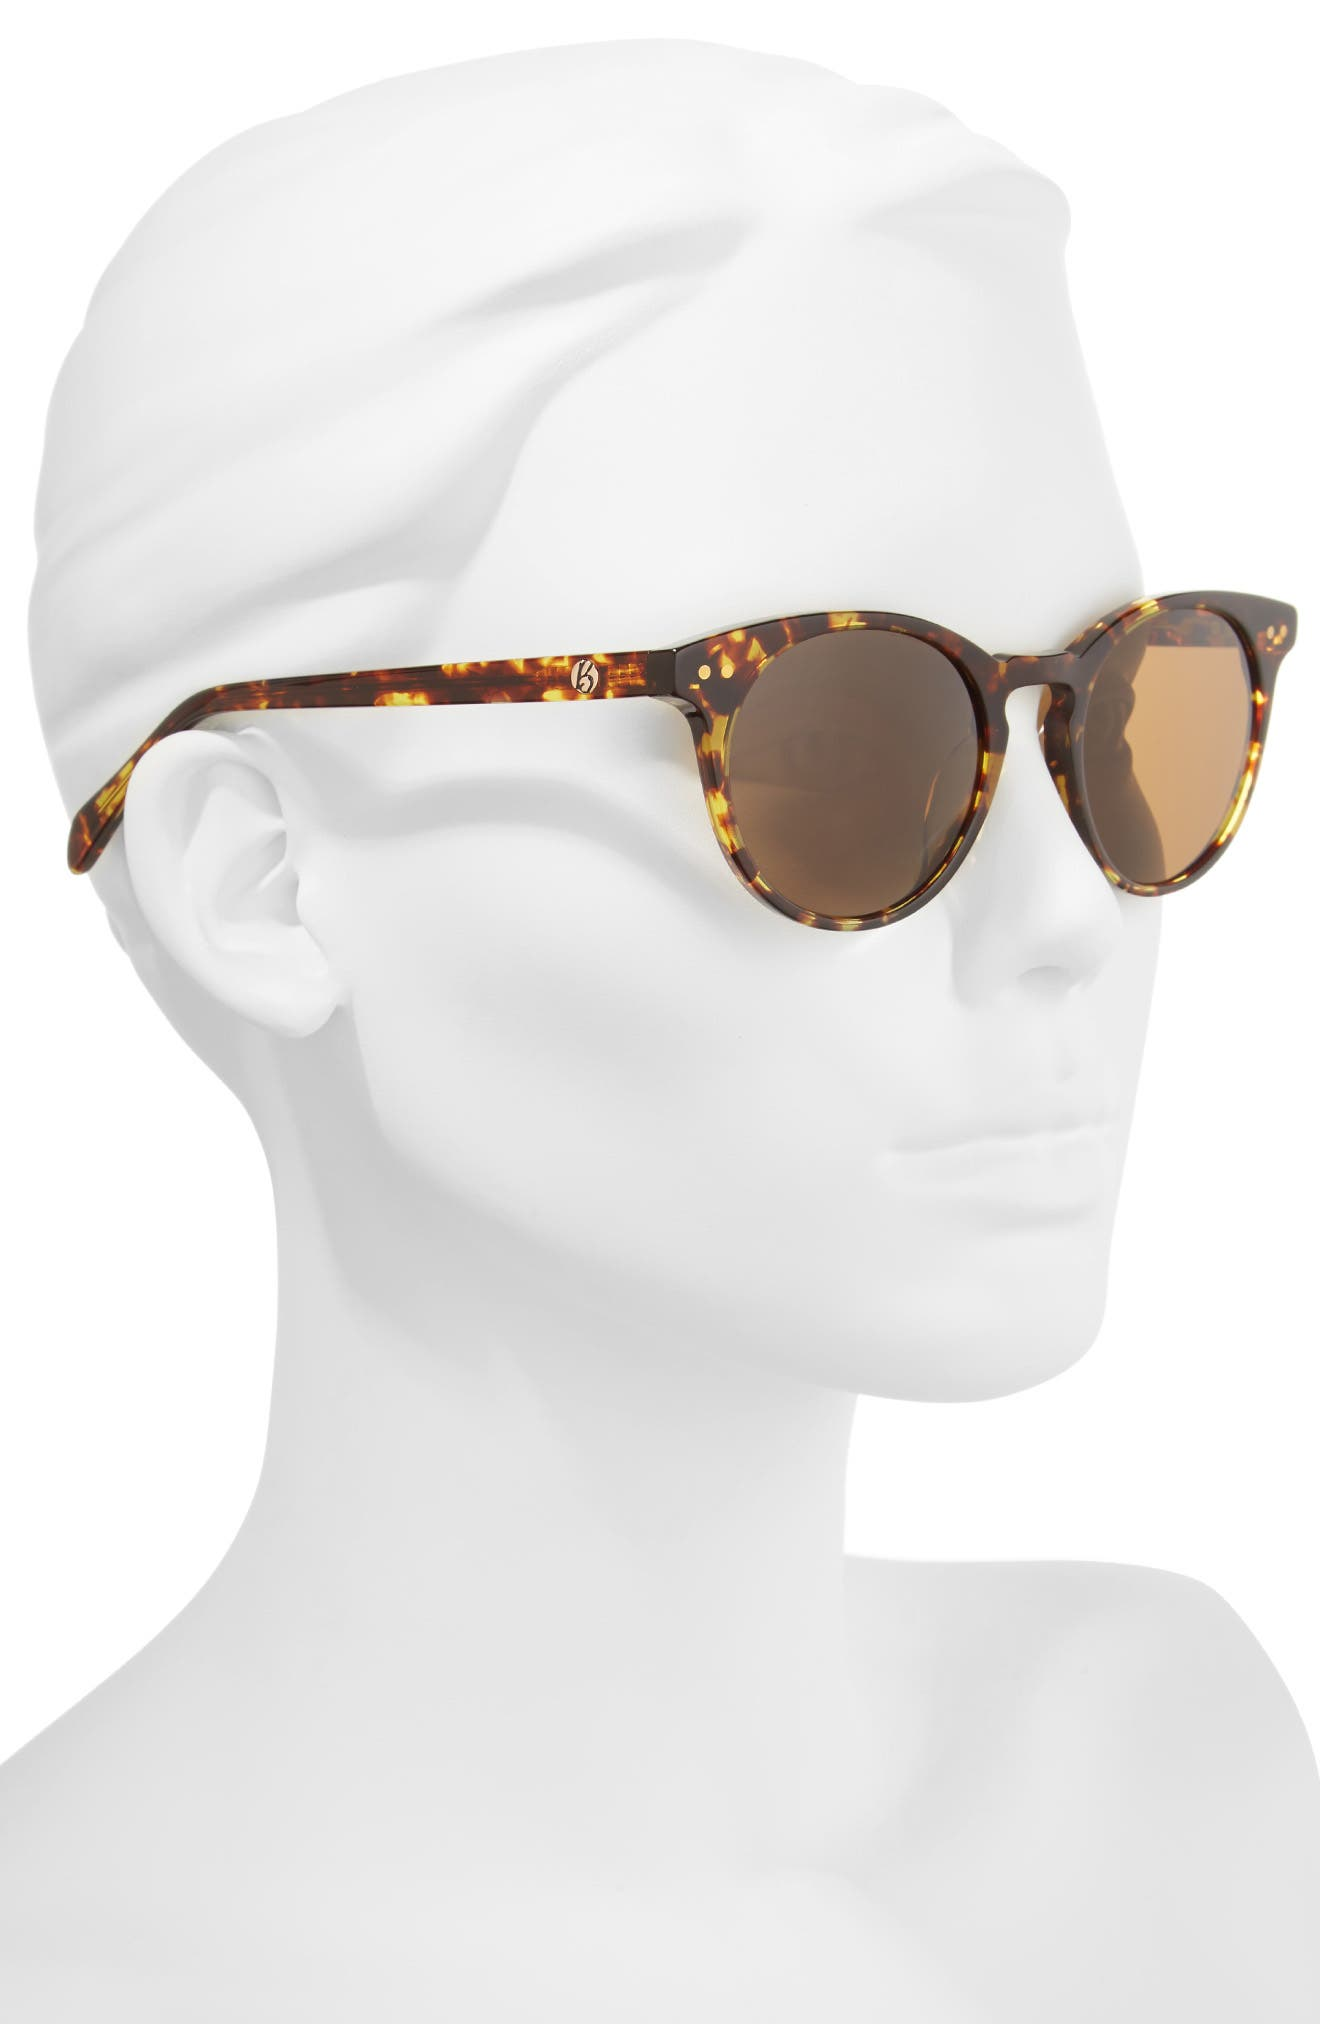 Oxford 49mm Sunglasses,                             Alternate thumbnail 2, color,                             Classic Tortoise/ Brown